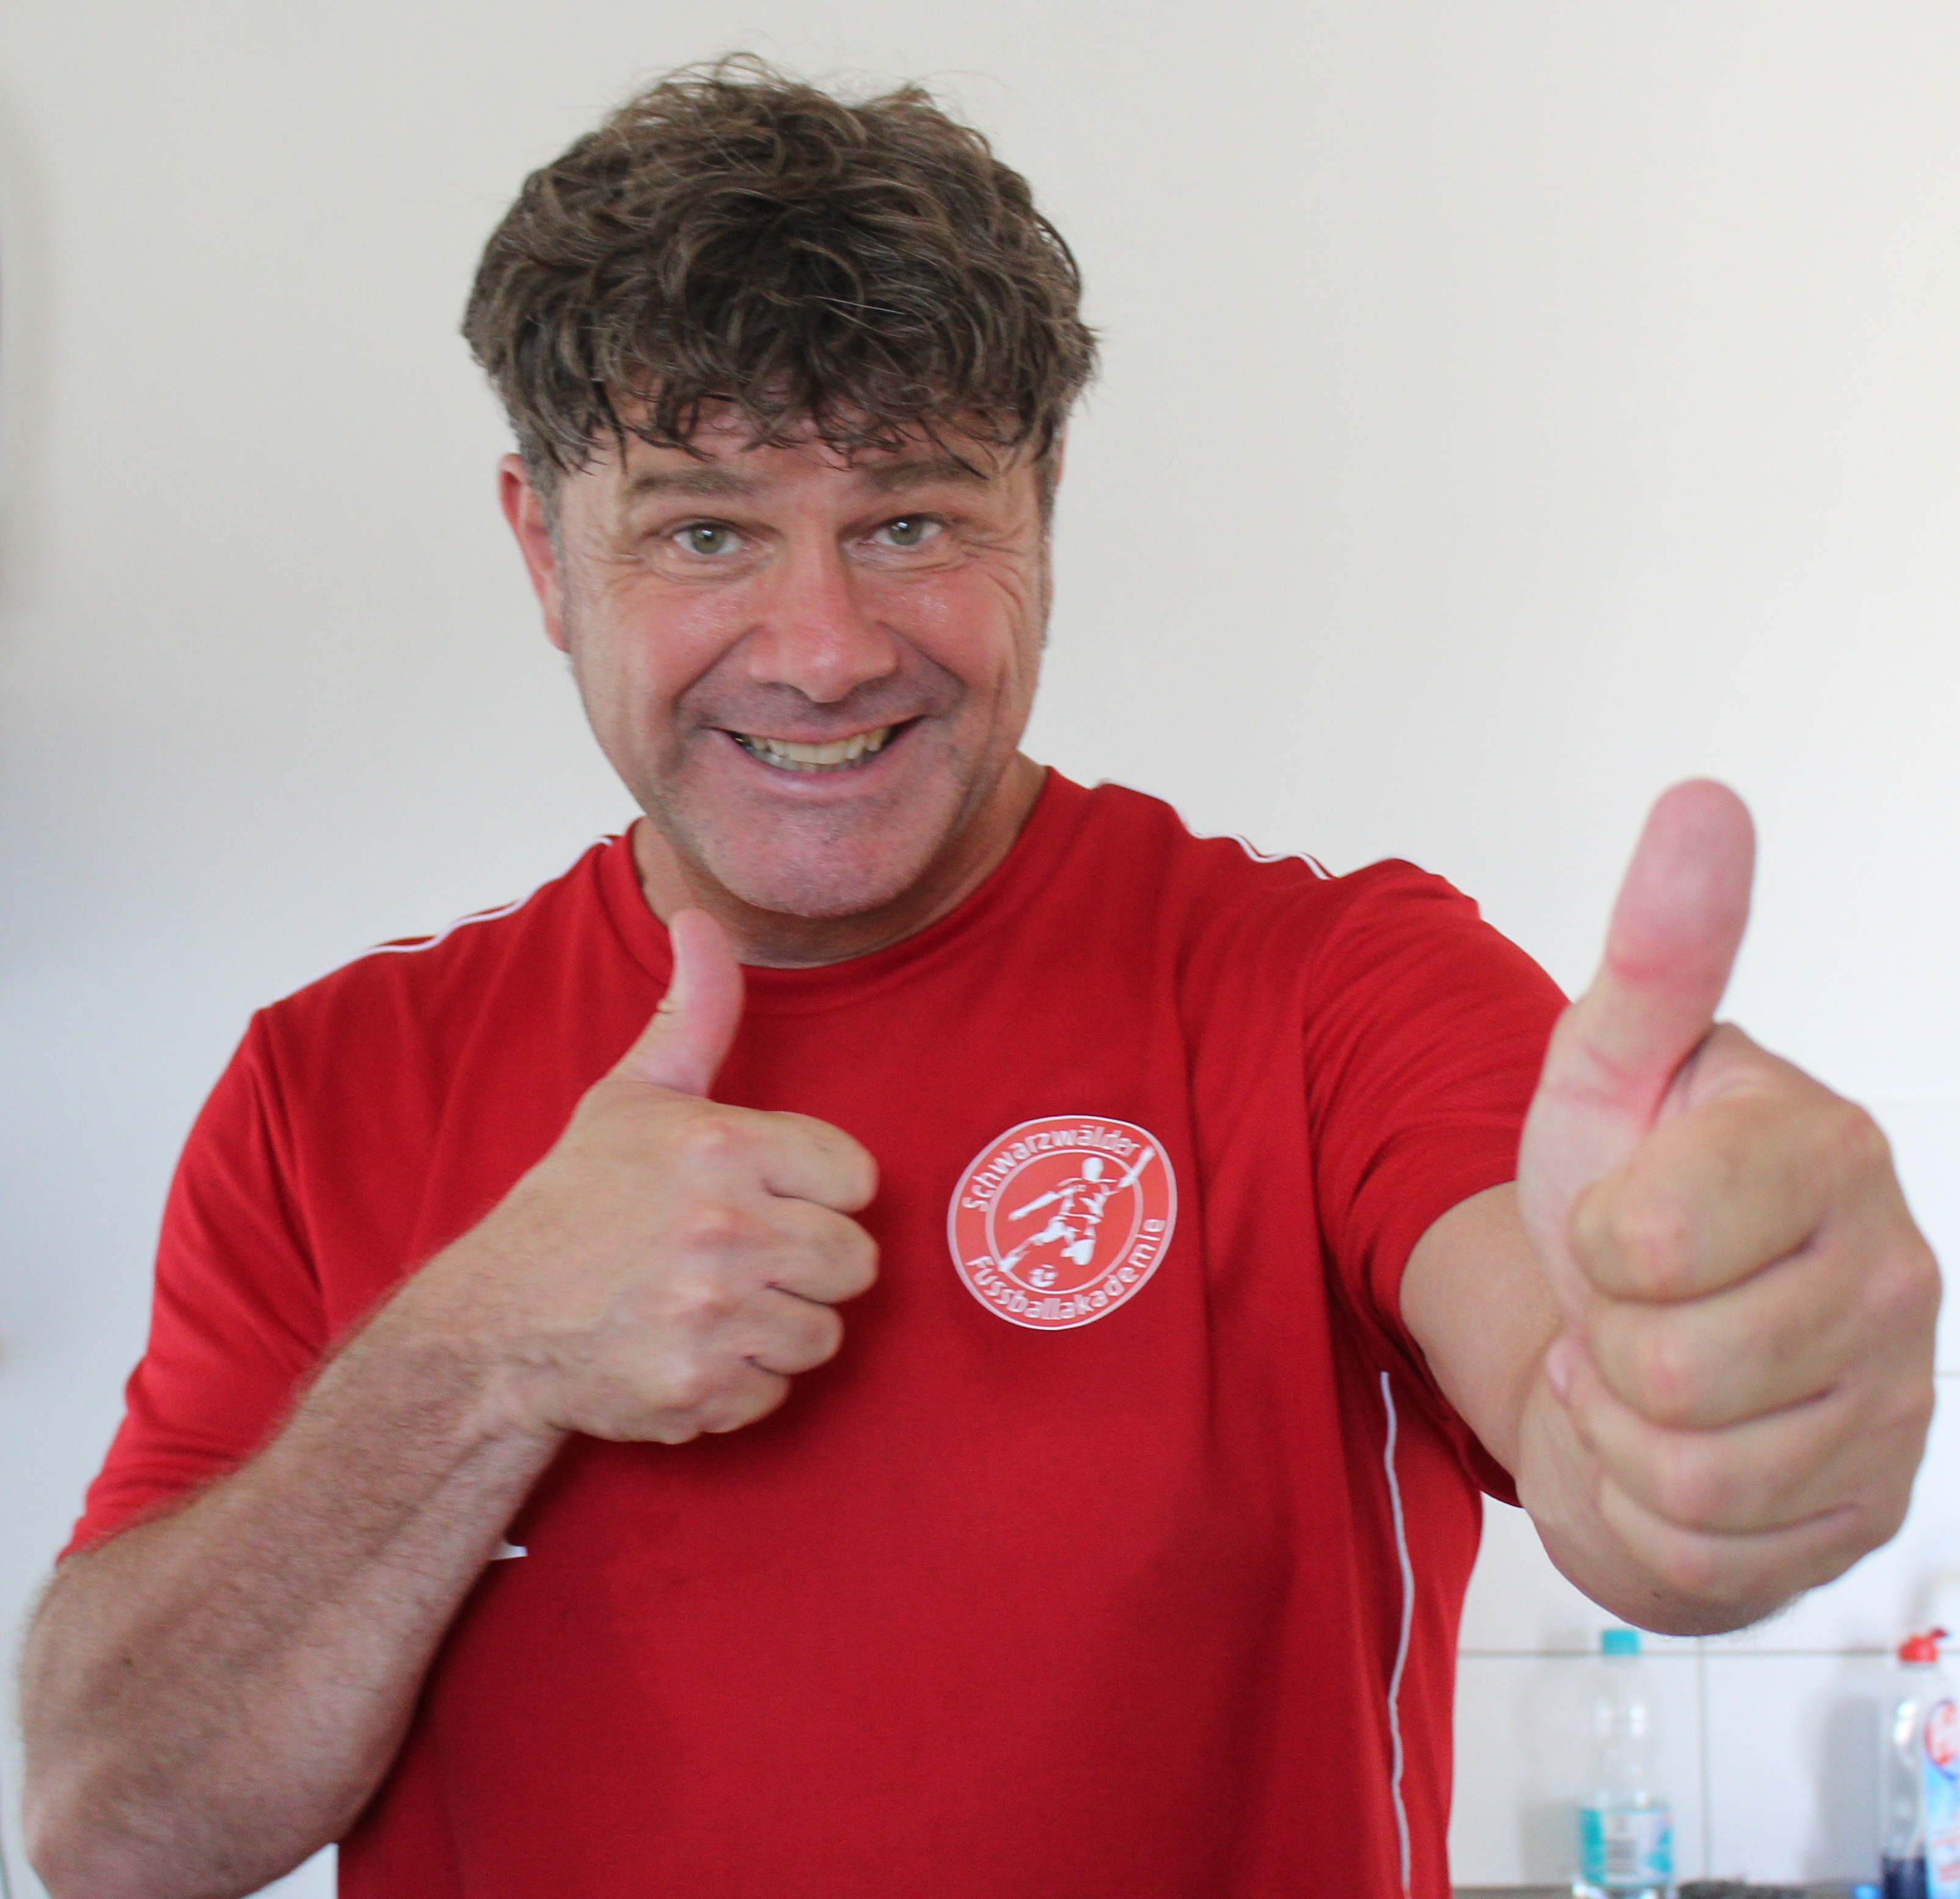 Manfred Flohr